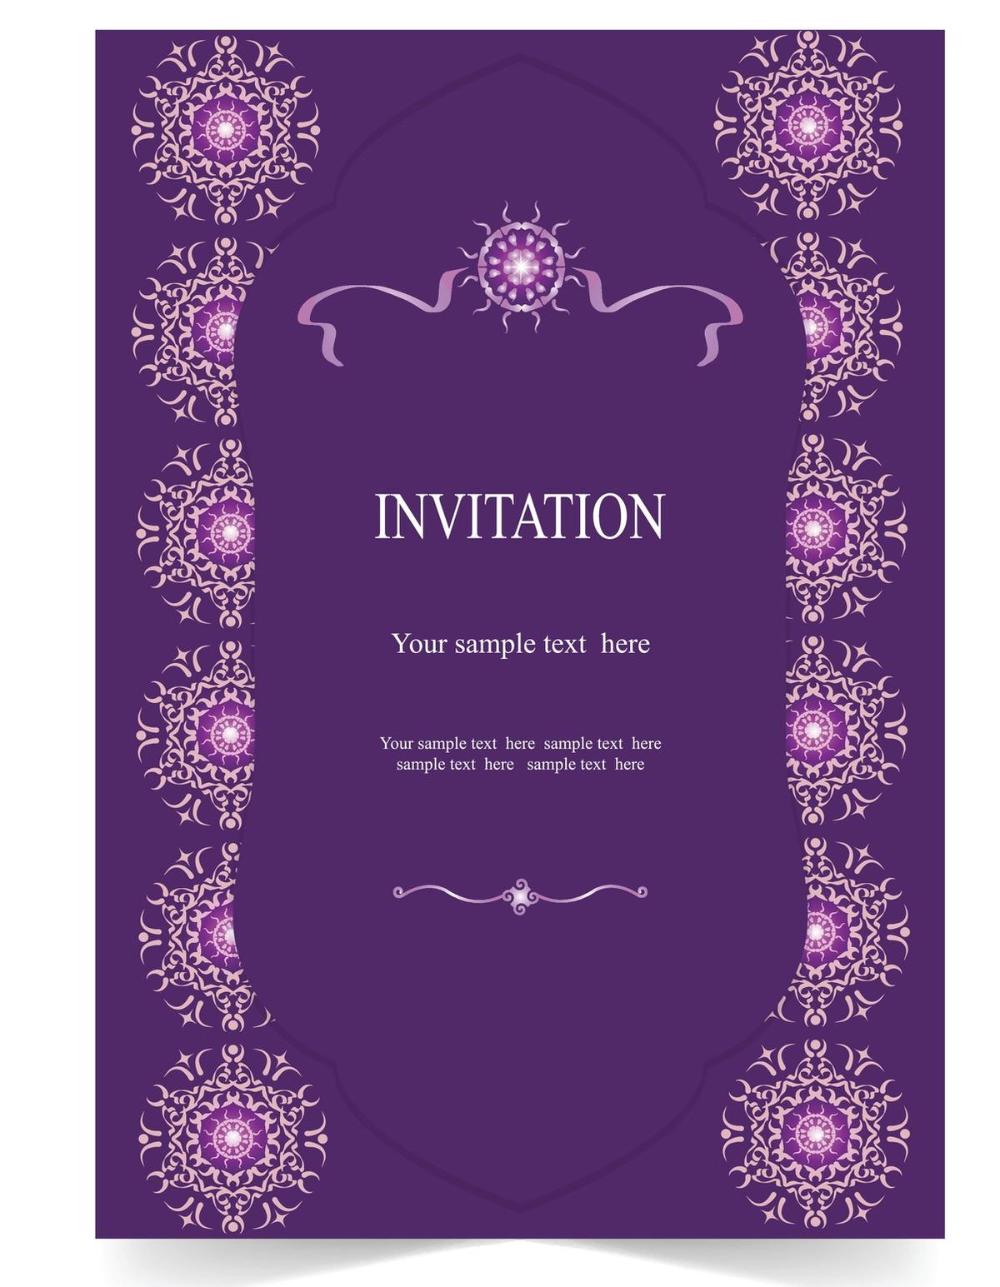 Invitation Template Background 6 Templates Example Templates Example Farewell Invitation Card Invitation Template Invitation Cards